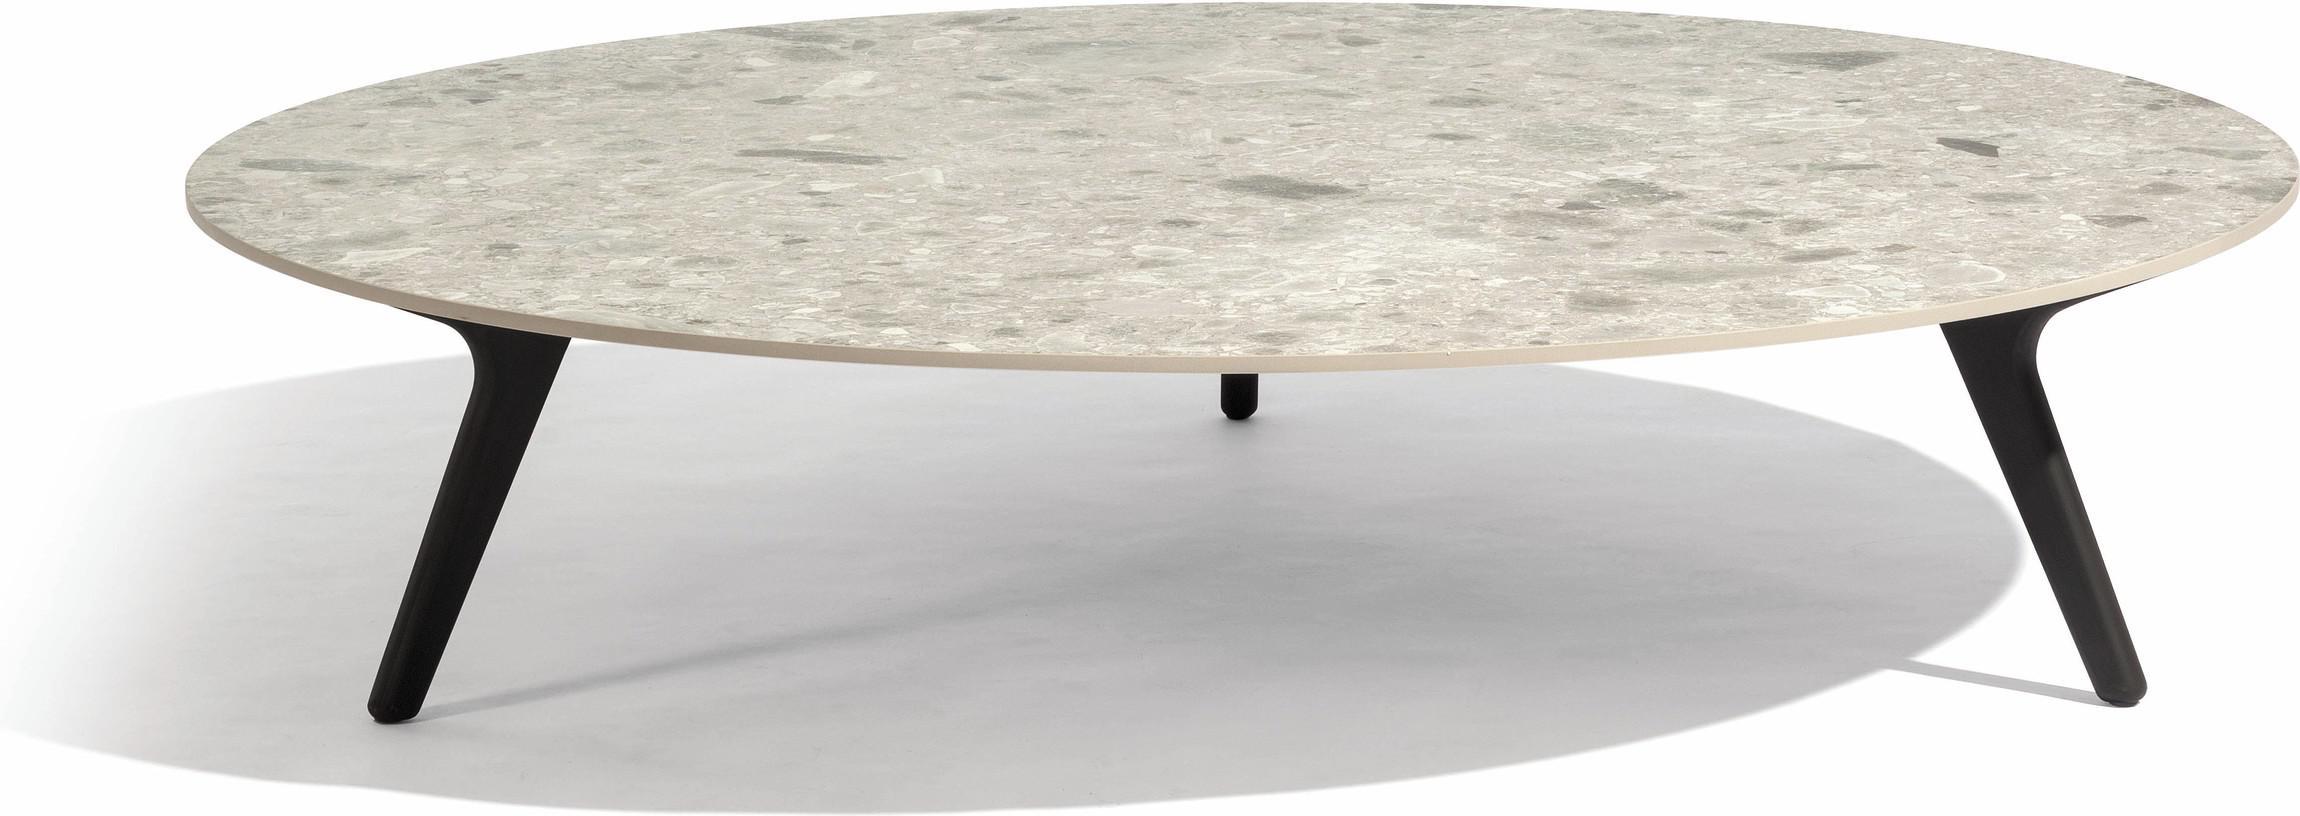 Torsa Low table - Teak nero - CF 148